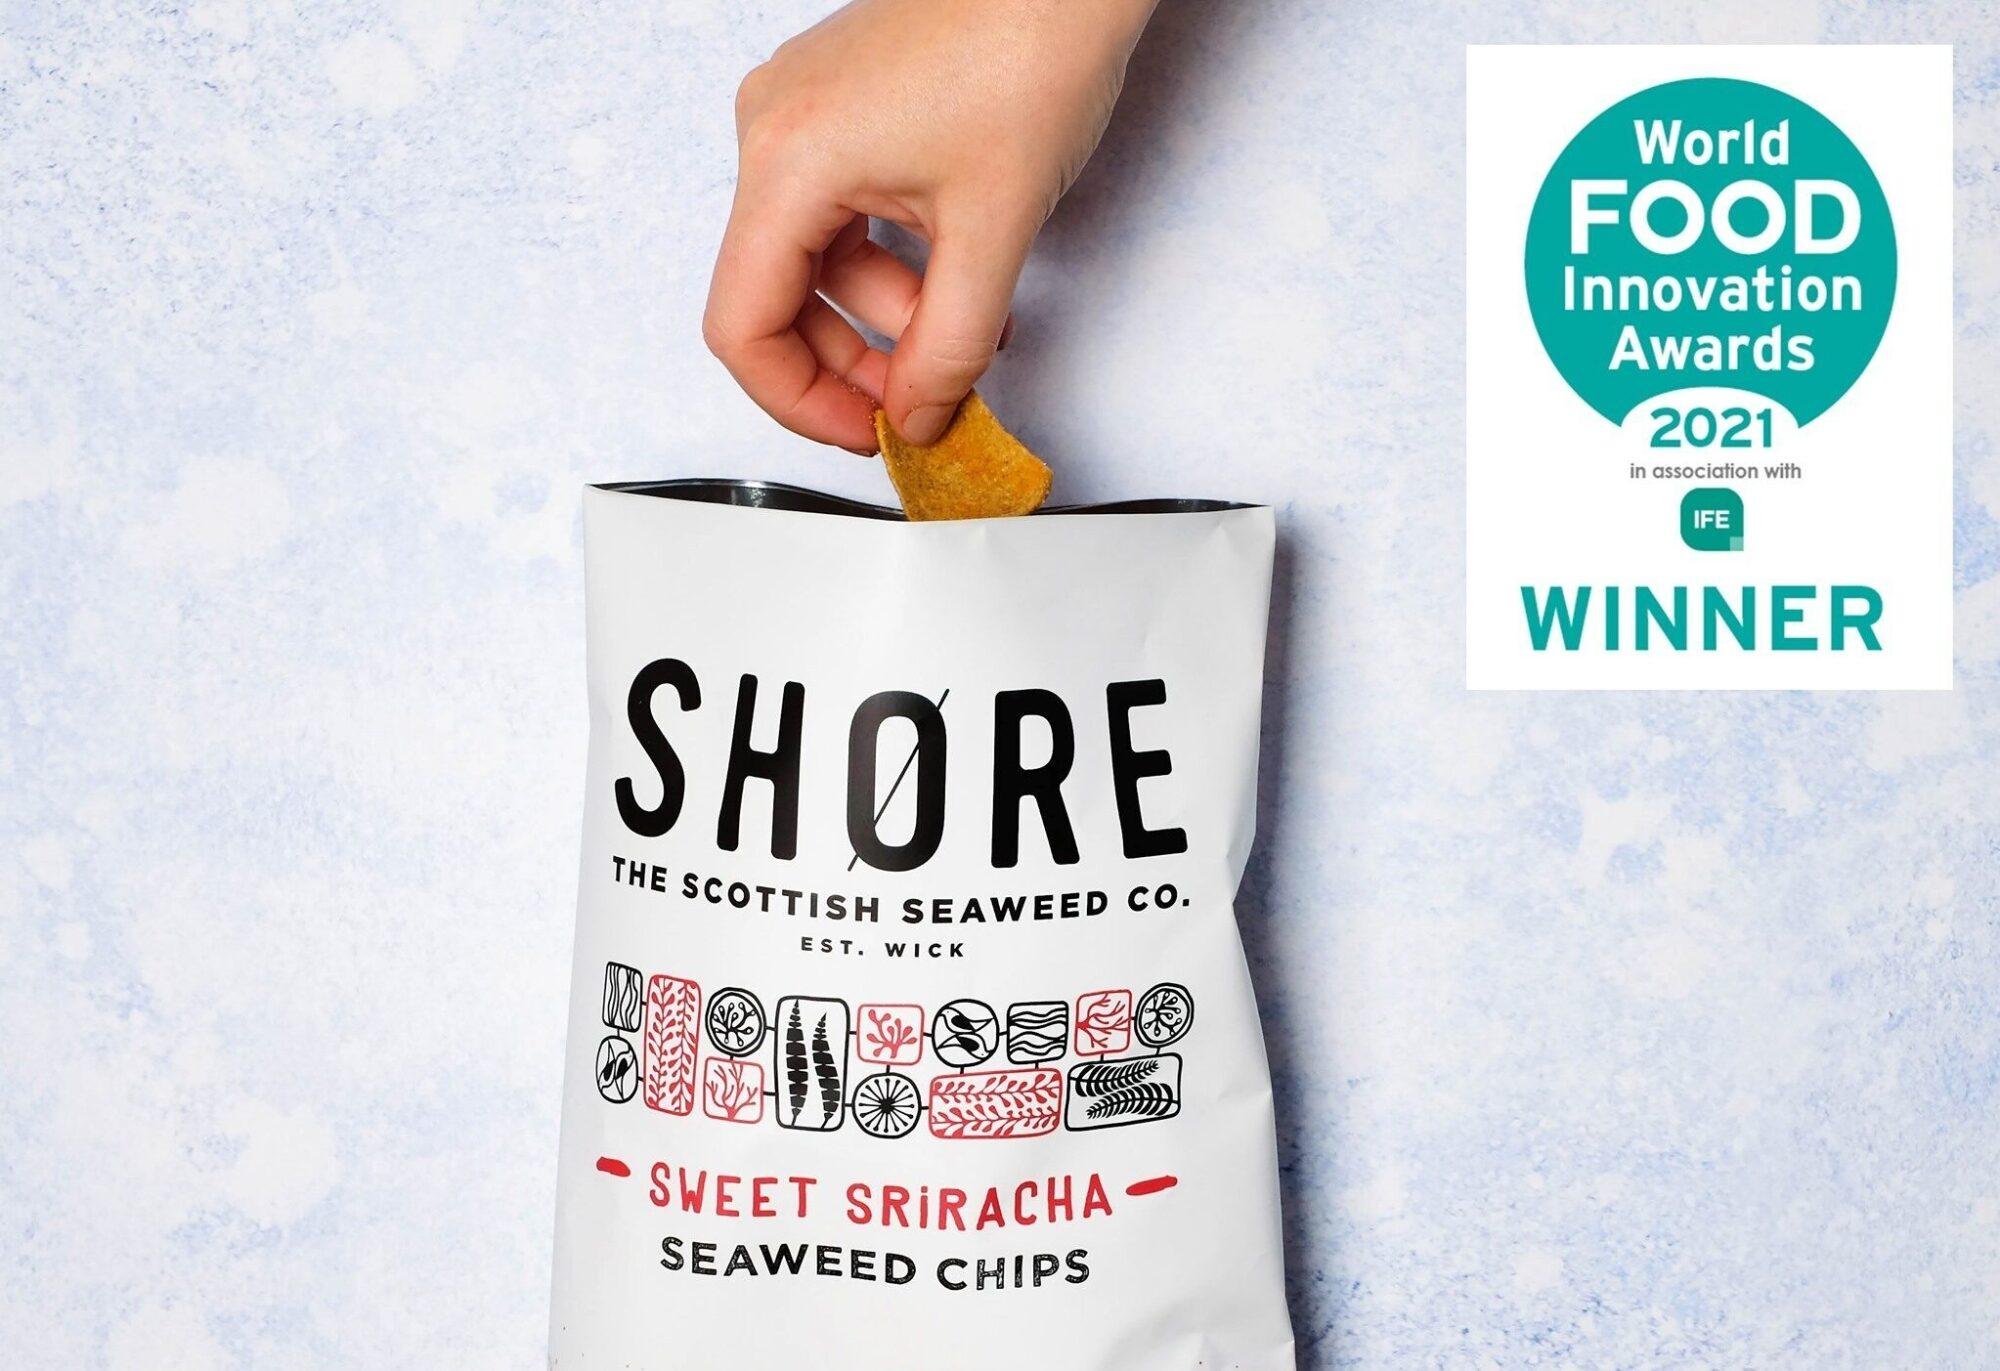 Shore_Seaweed_Food_Innovation_Award.jpg